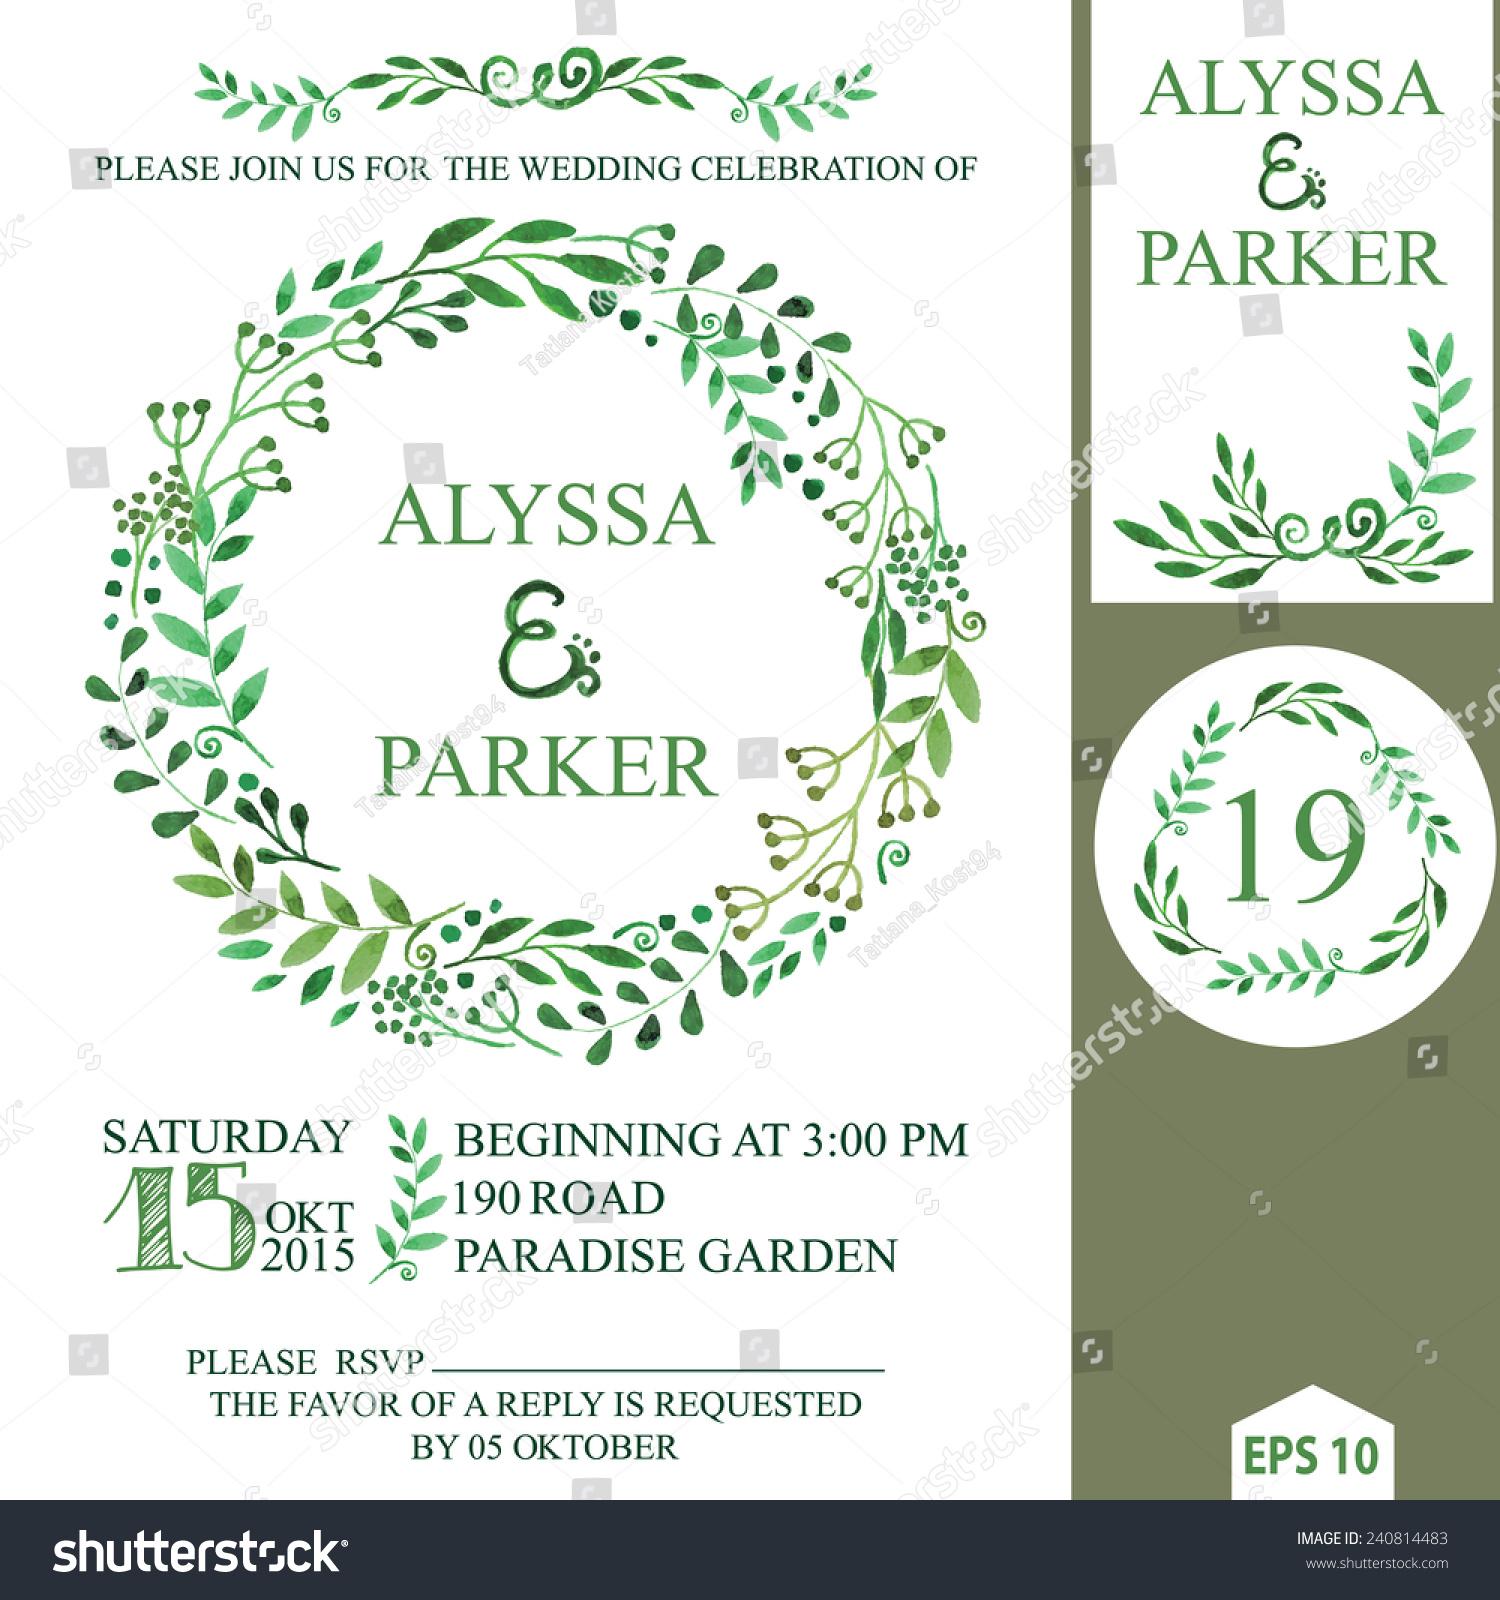 retro wedding invitation design template watercolor stock vector 240814483 shutterstock. Black Bedroom Furniture Sets. Home Design Ideas